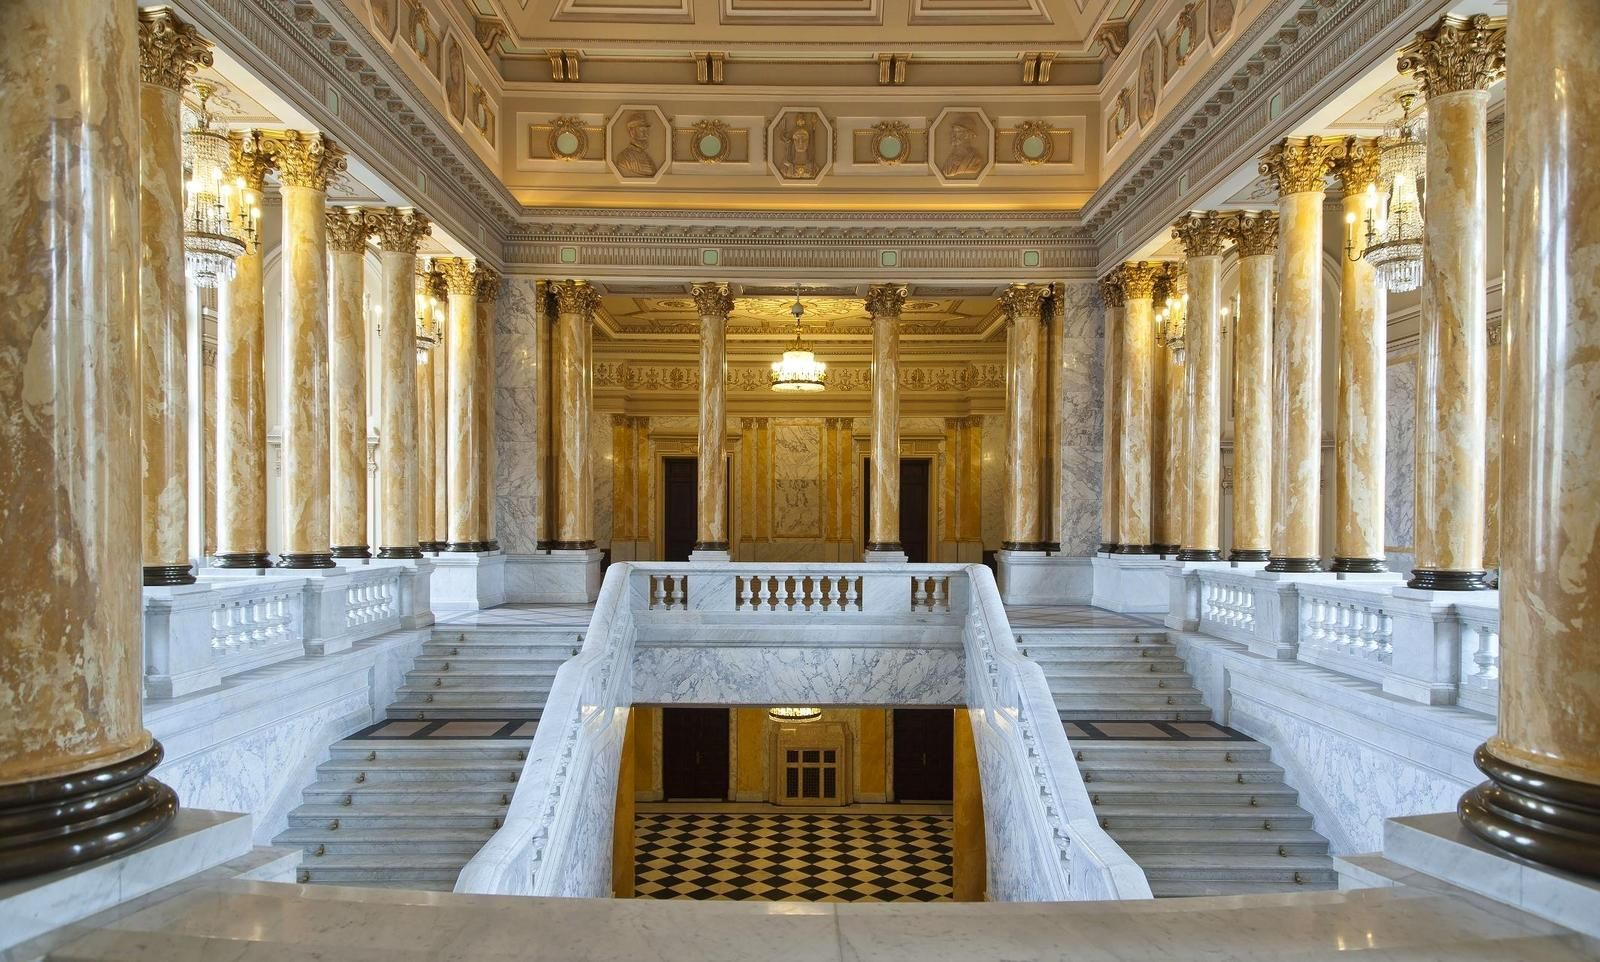 Romania Dacia on WordPress.com | National museum, Marble columns, European  palace